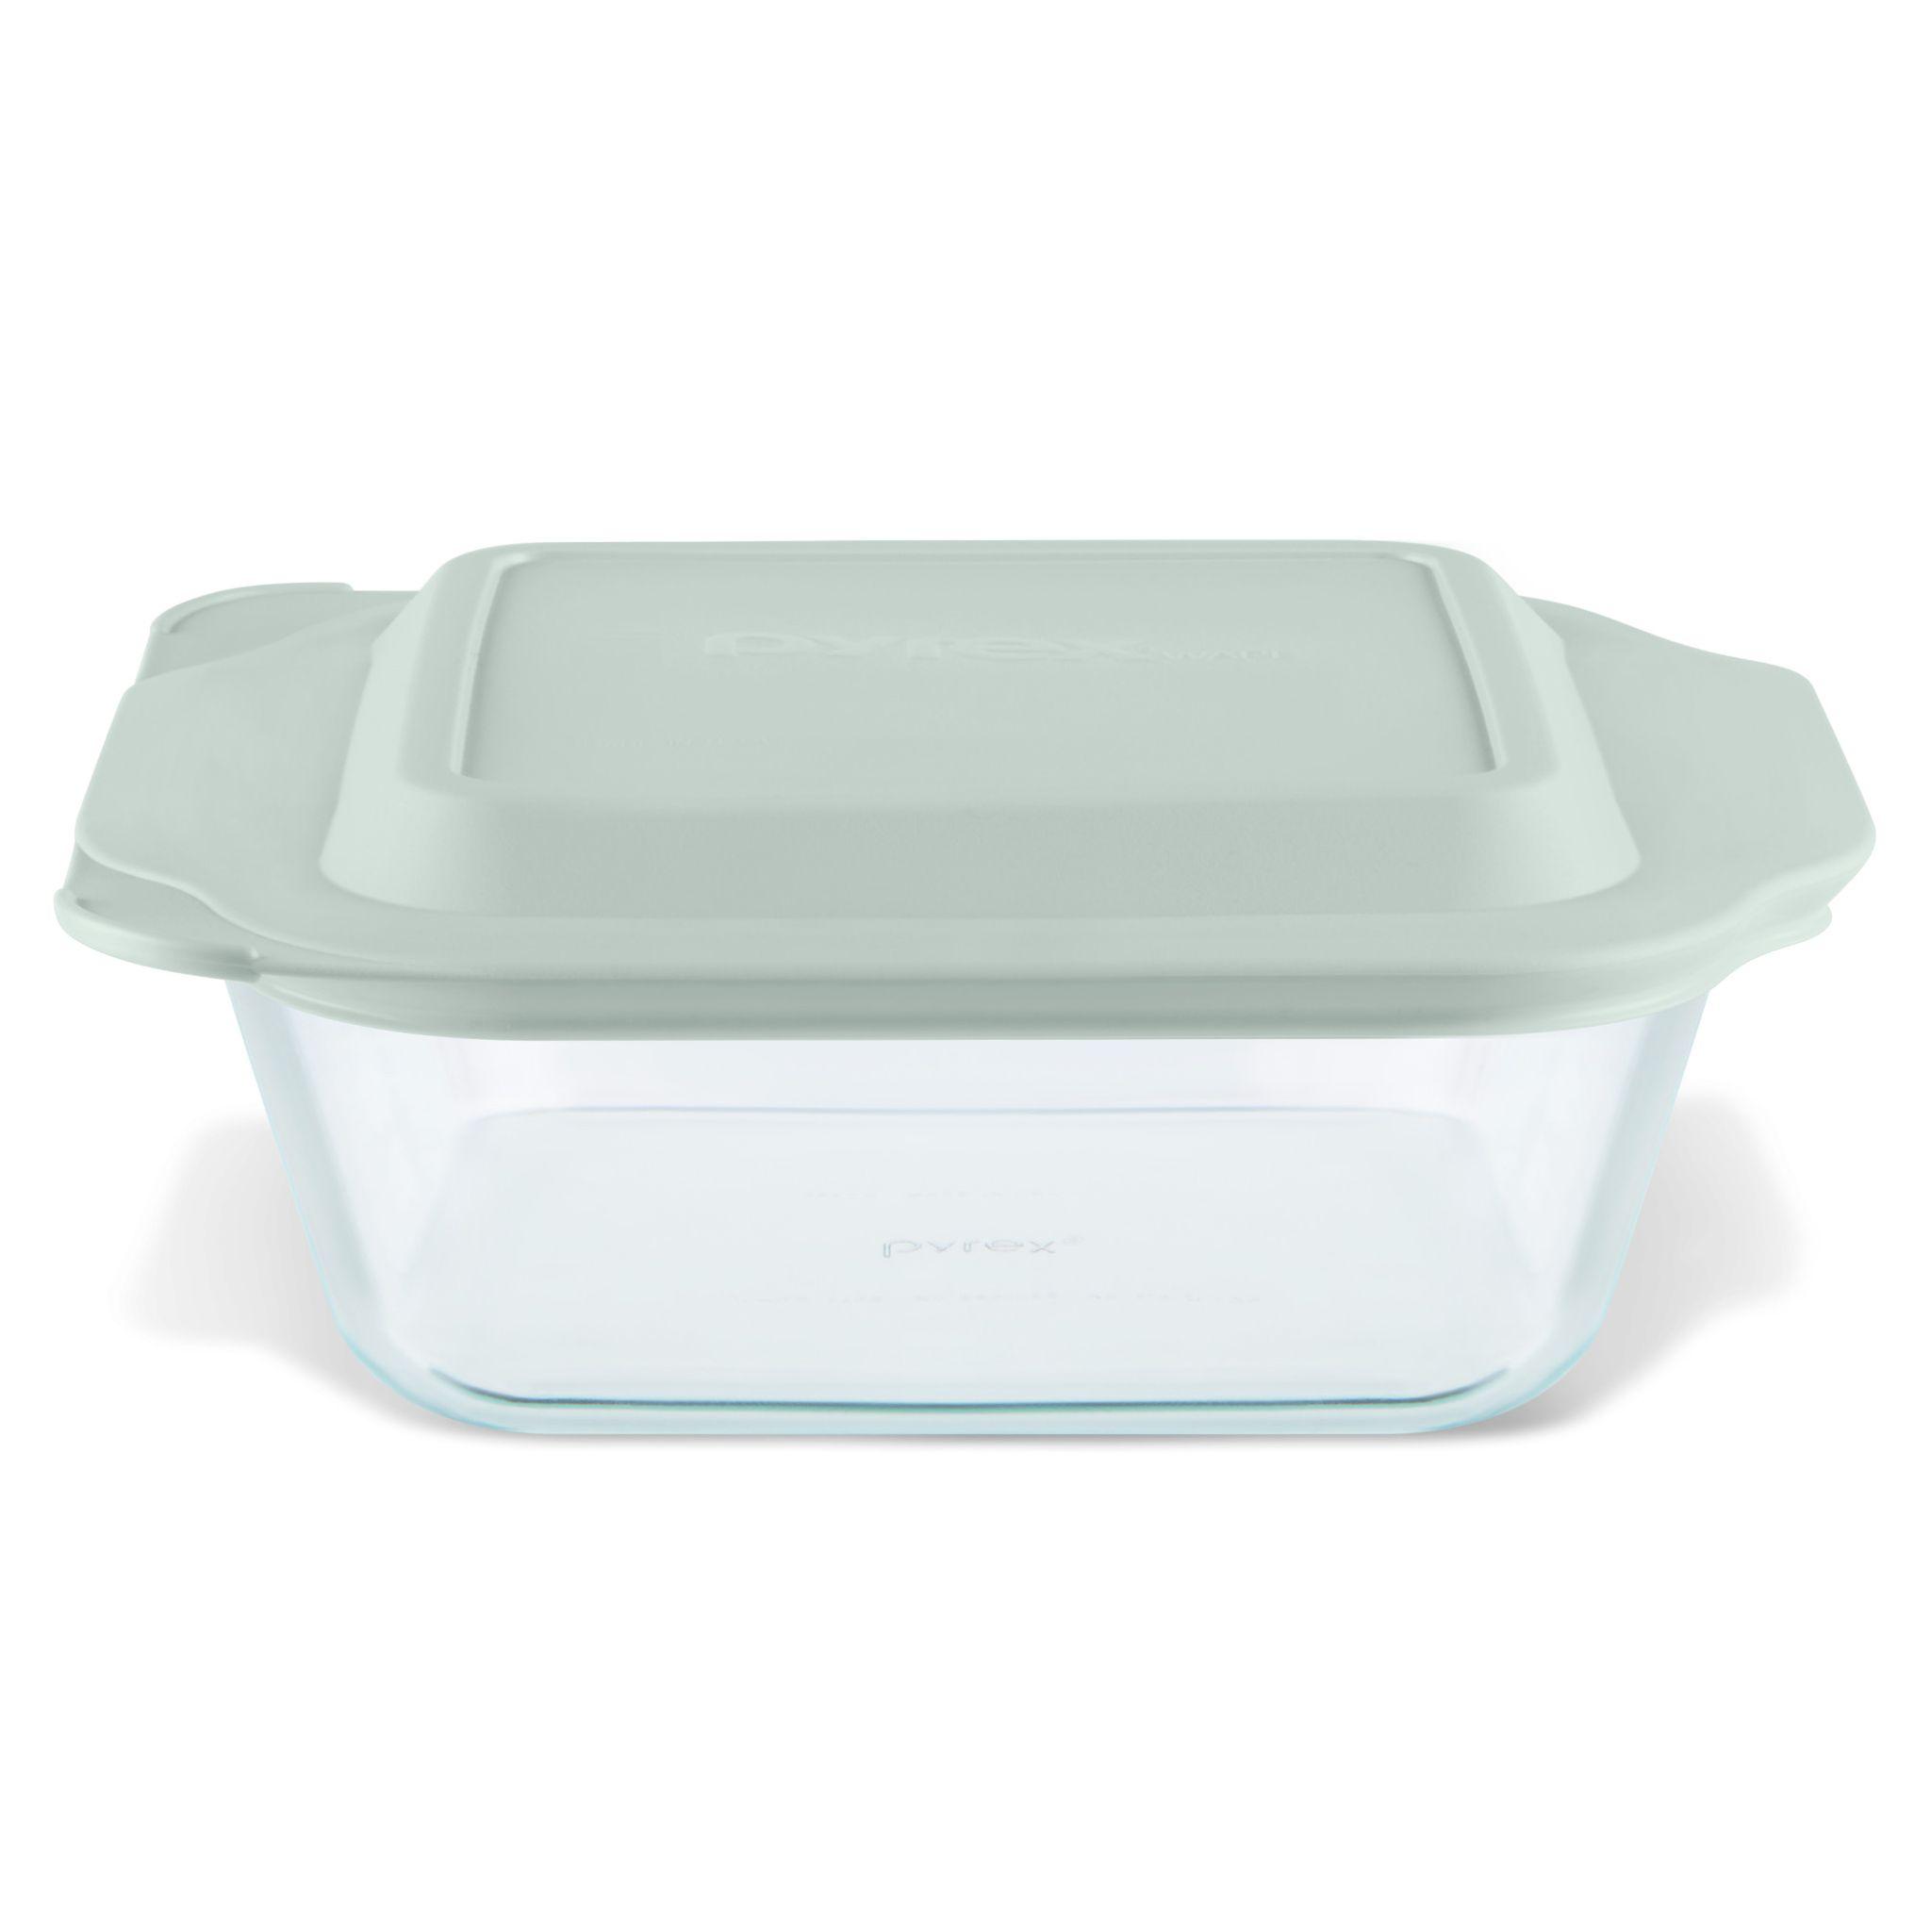 PyrexR 8 X 27 Square Deeper Baking Dish W Sage Lid